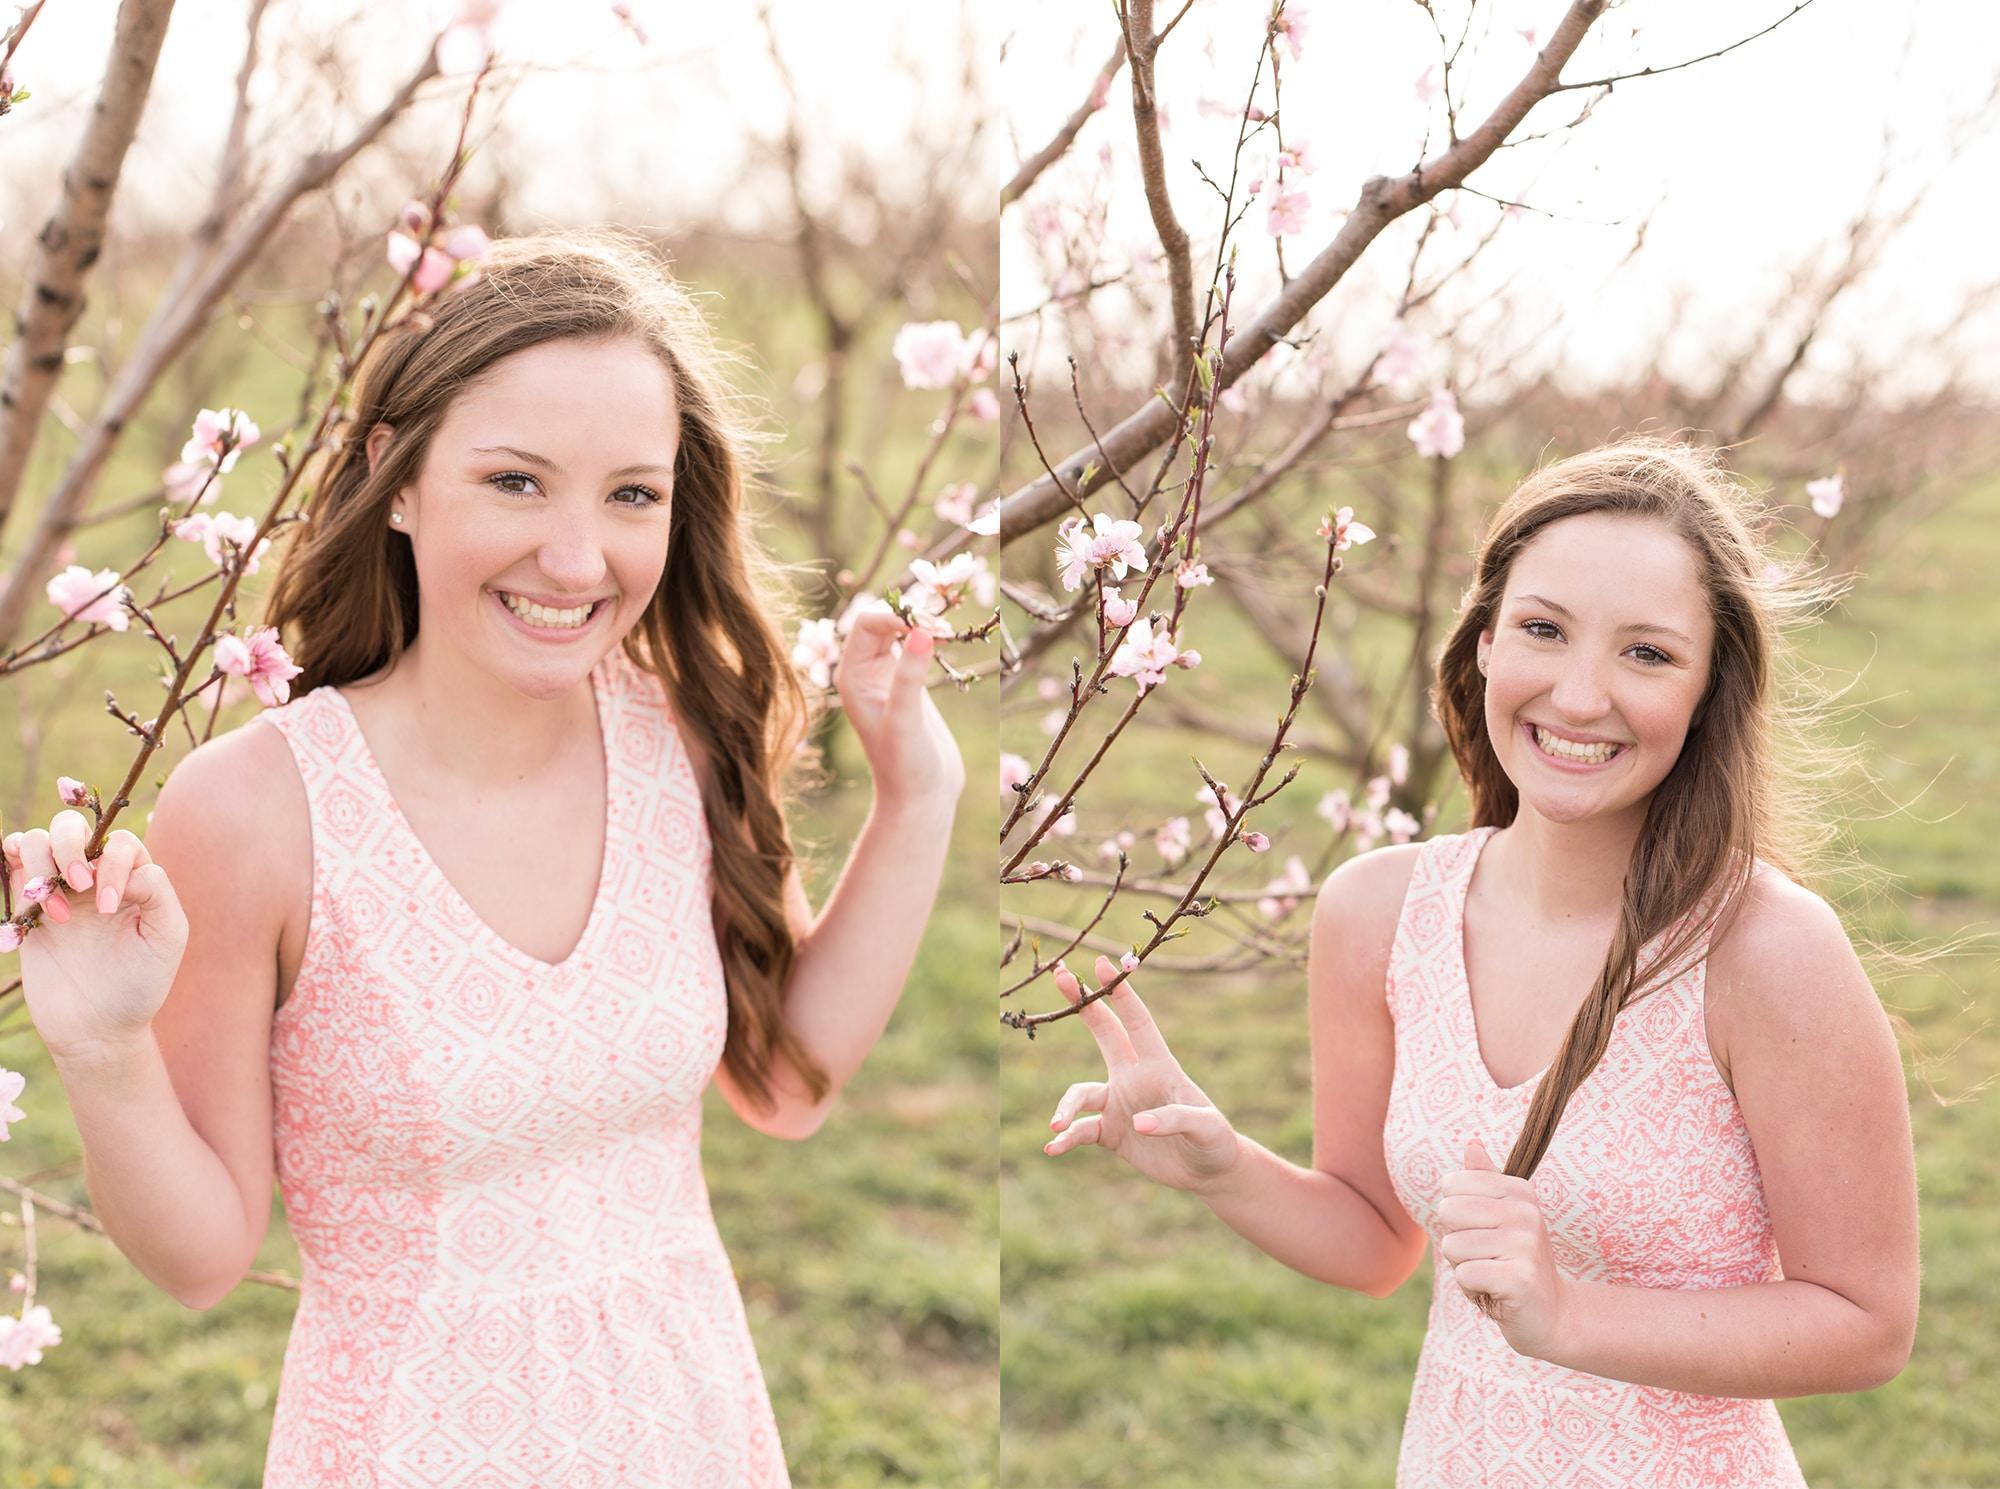 Maya Rayburn: Goodbye to Braces! | Lafayette, Indiana Senior Photos | Luminant Photography | Victoria Rayburn | Celebrate Getting Your Braces Off | Senior Pictures in Lafayette, Indiana